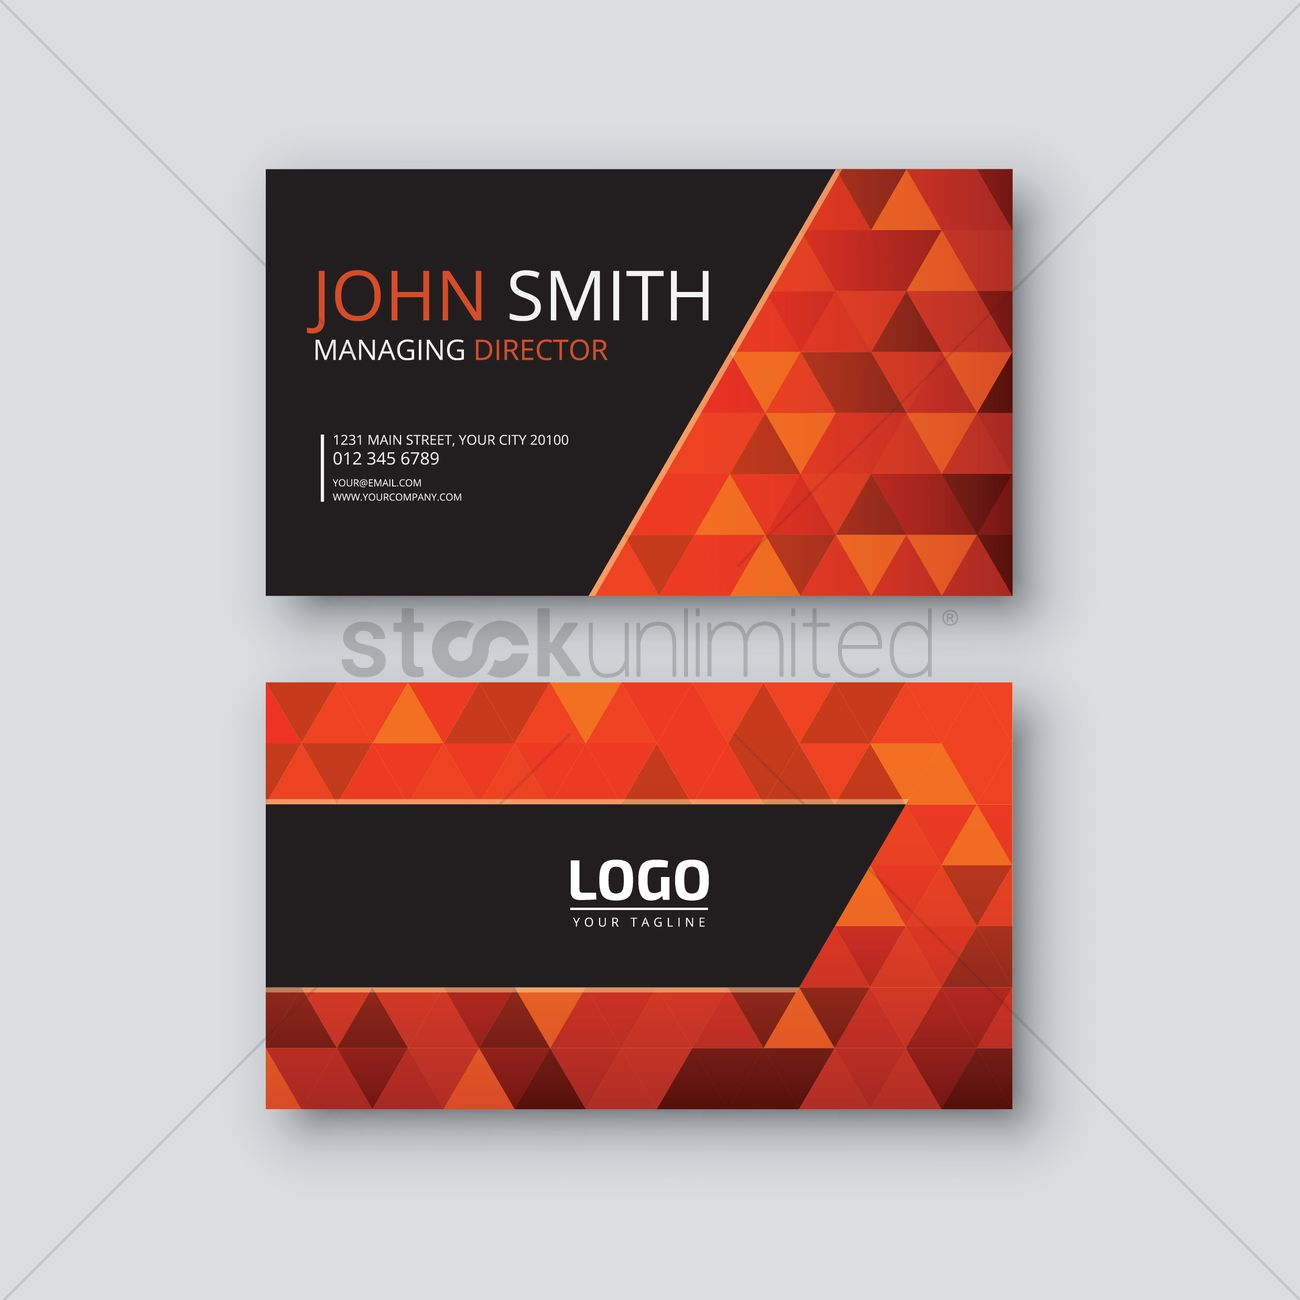 Visiting card vector image 1823278 stockunlimited visiting card vector graphic colourmoves